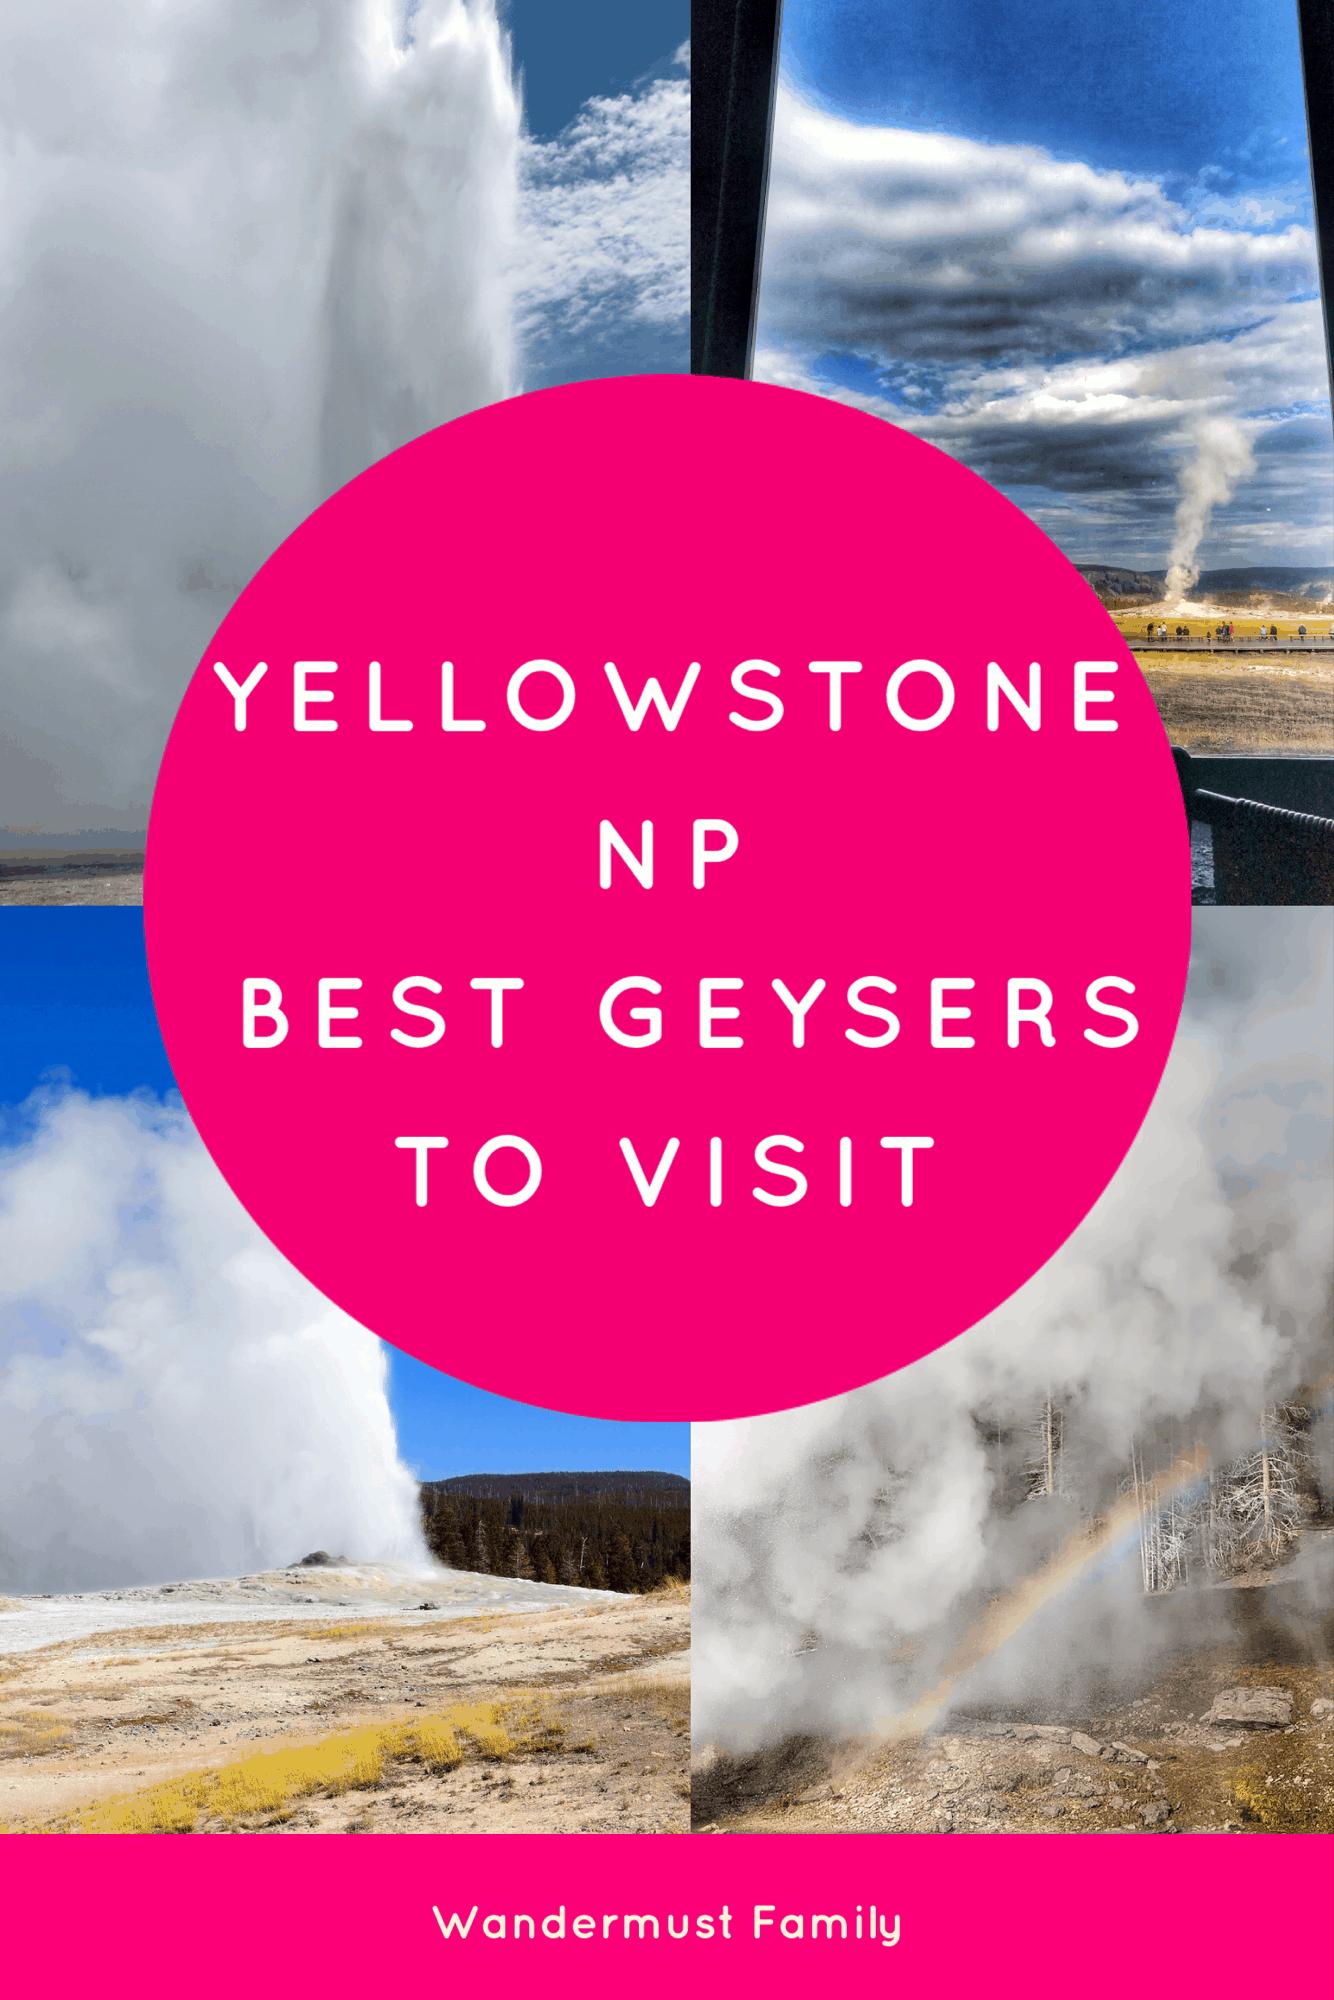 Best Geysers in Yellowstone. The Best Yellowstone Geysers - a list of the ultimate Yellowstone attractions - geyser edition including Old Faithful! #yellowstone #yellowstonenp #yellowstonenationalpark #visitingyellowstone #oldfaithful #yellowstonegeysers #geysers